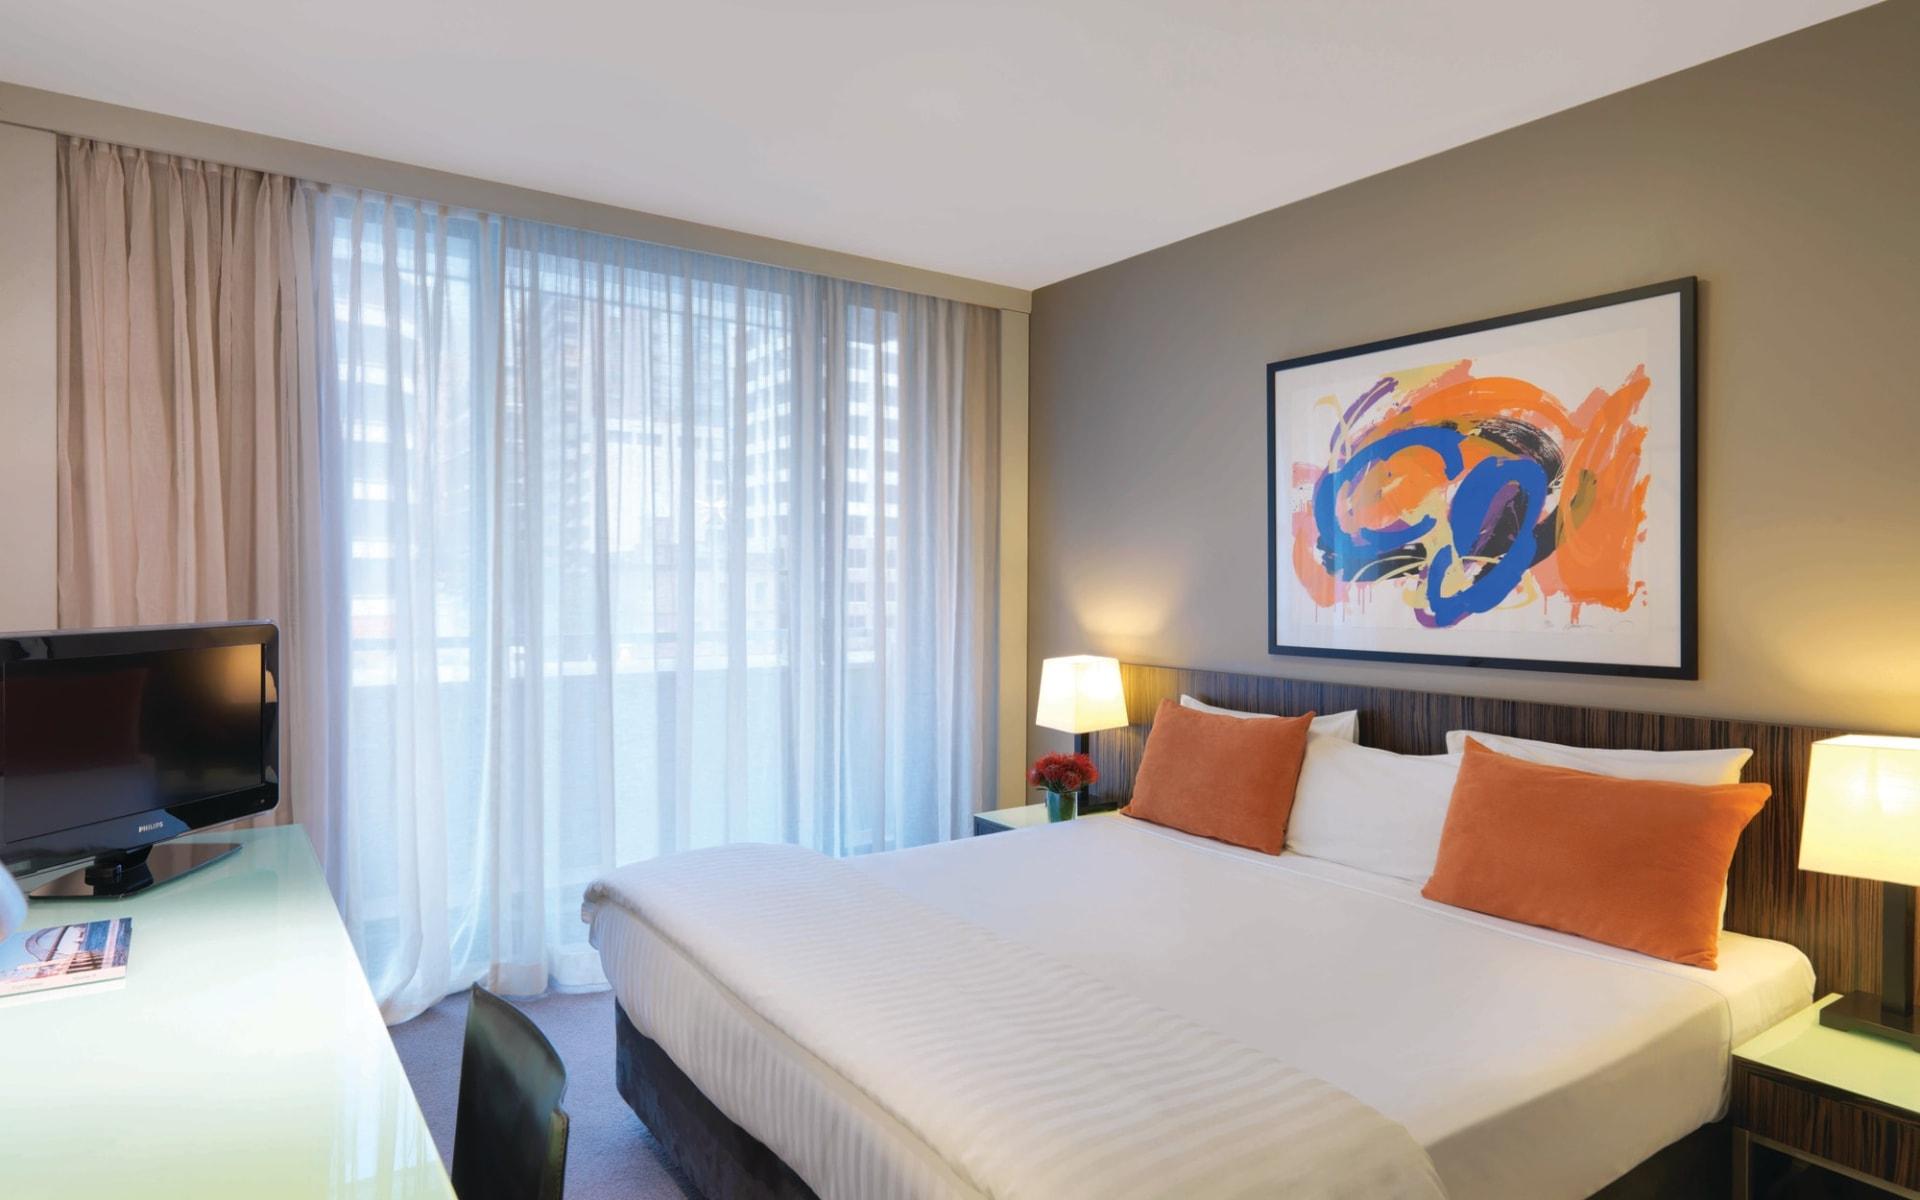 Adina Apartment Hotel Sydney Darling Harbour:  Adina Apartment Hotel Sydney Harbourside - 1-Bedroom Apartment